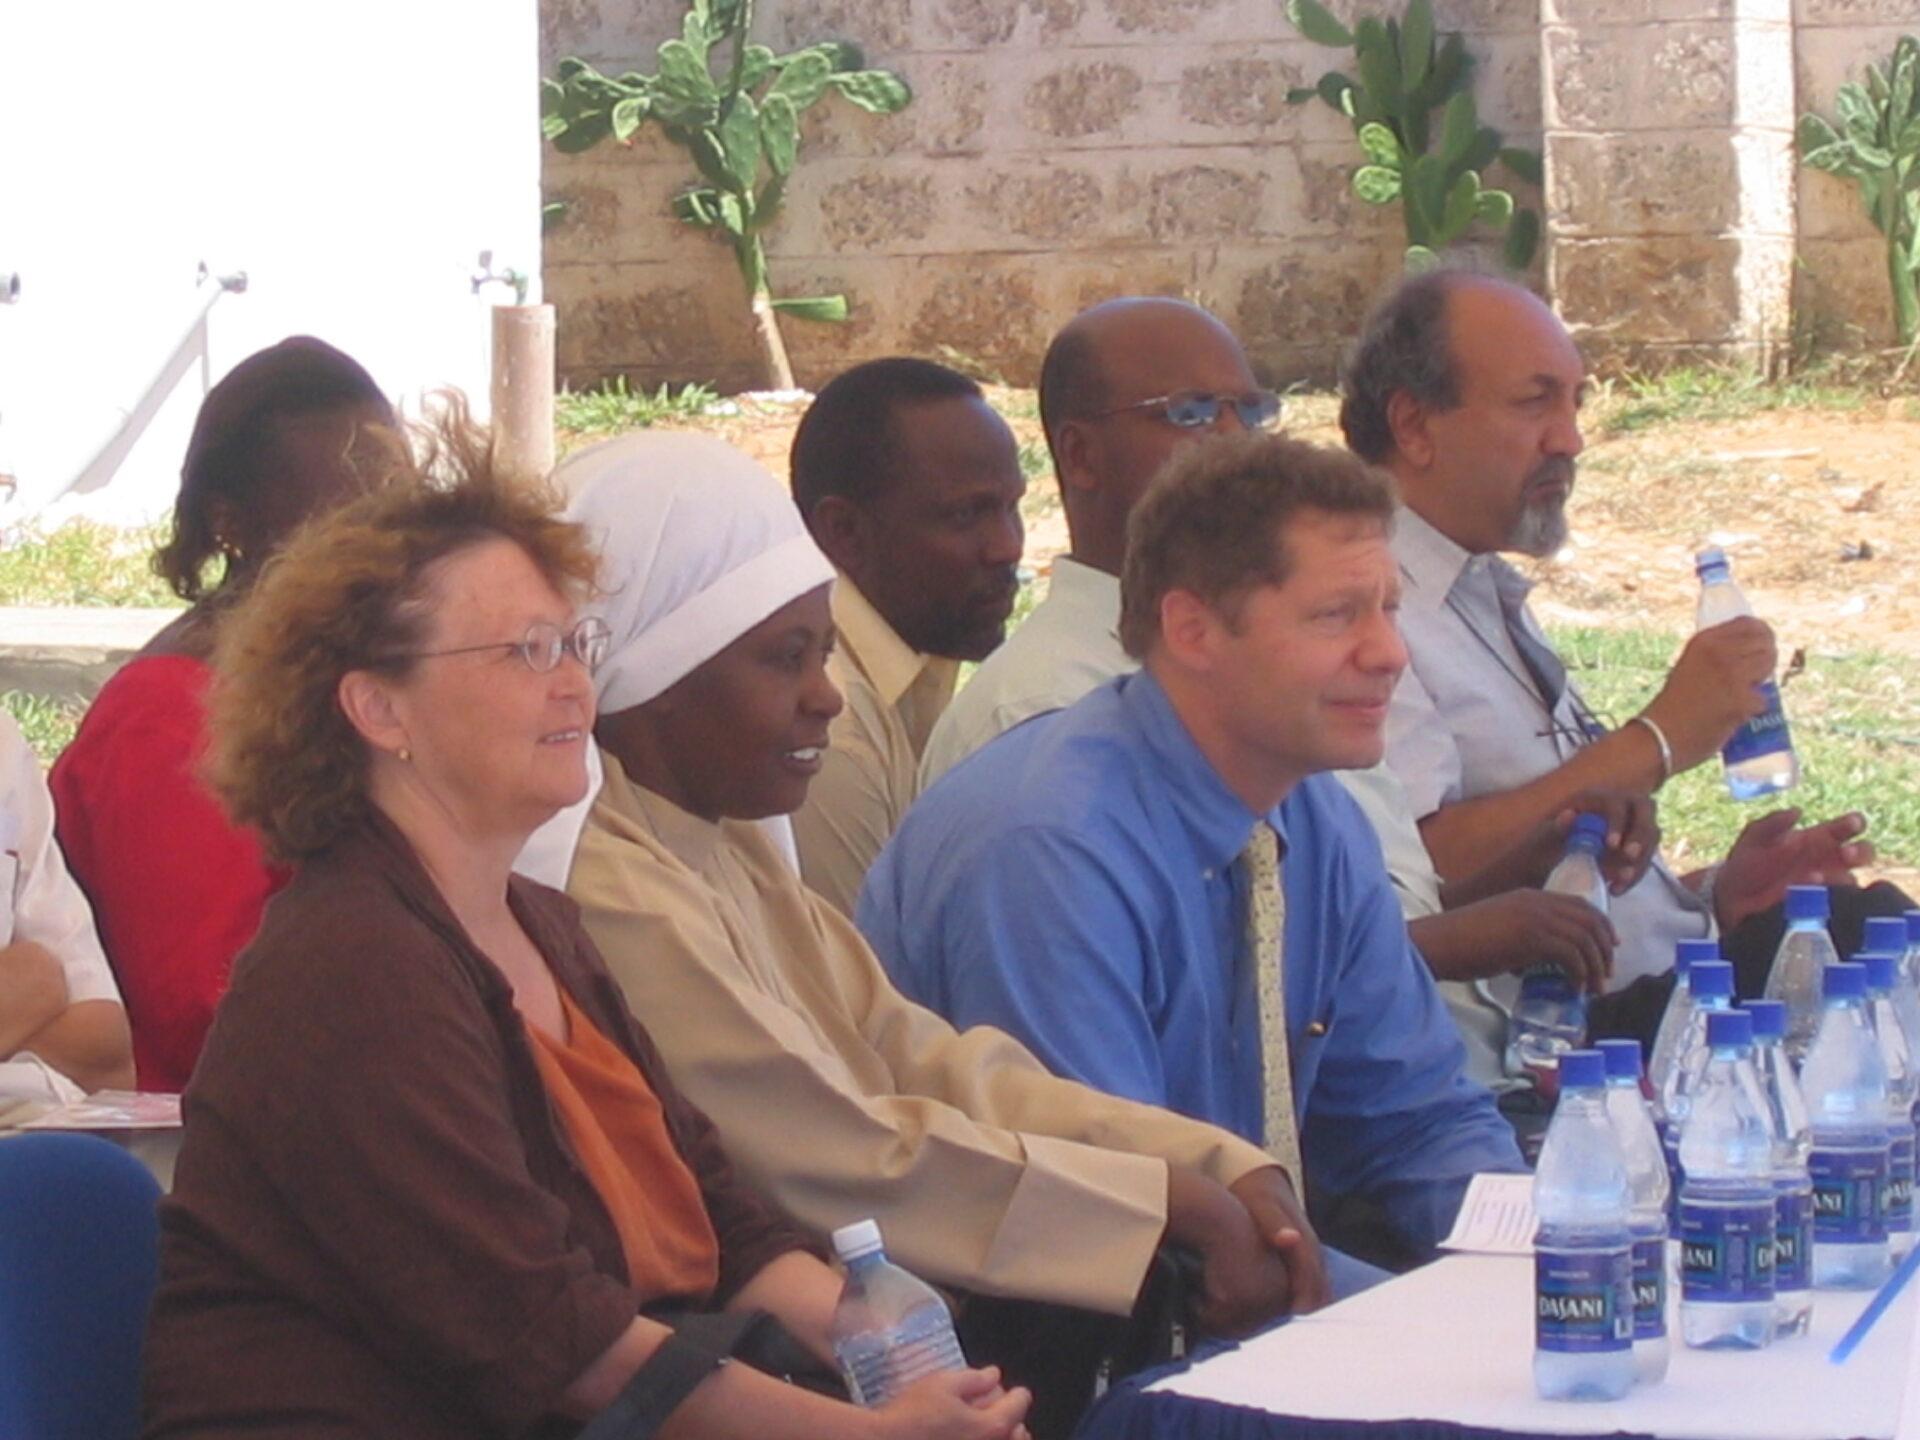 Photo of audience, including Seth Berkley, at opening of new KEMRI-Kilifi buildings